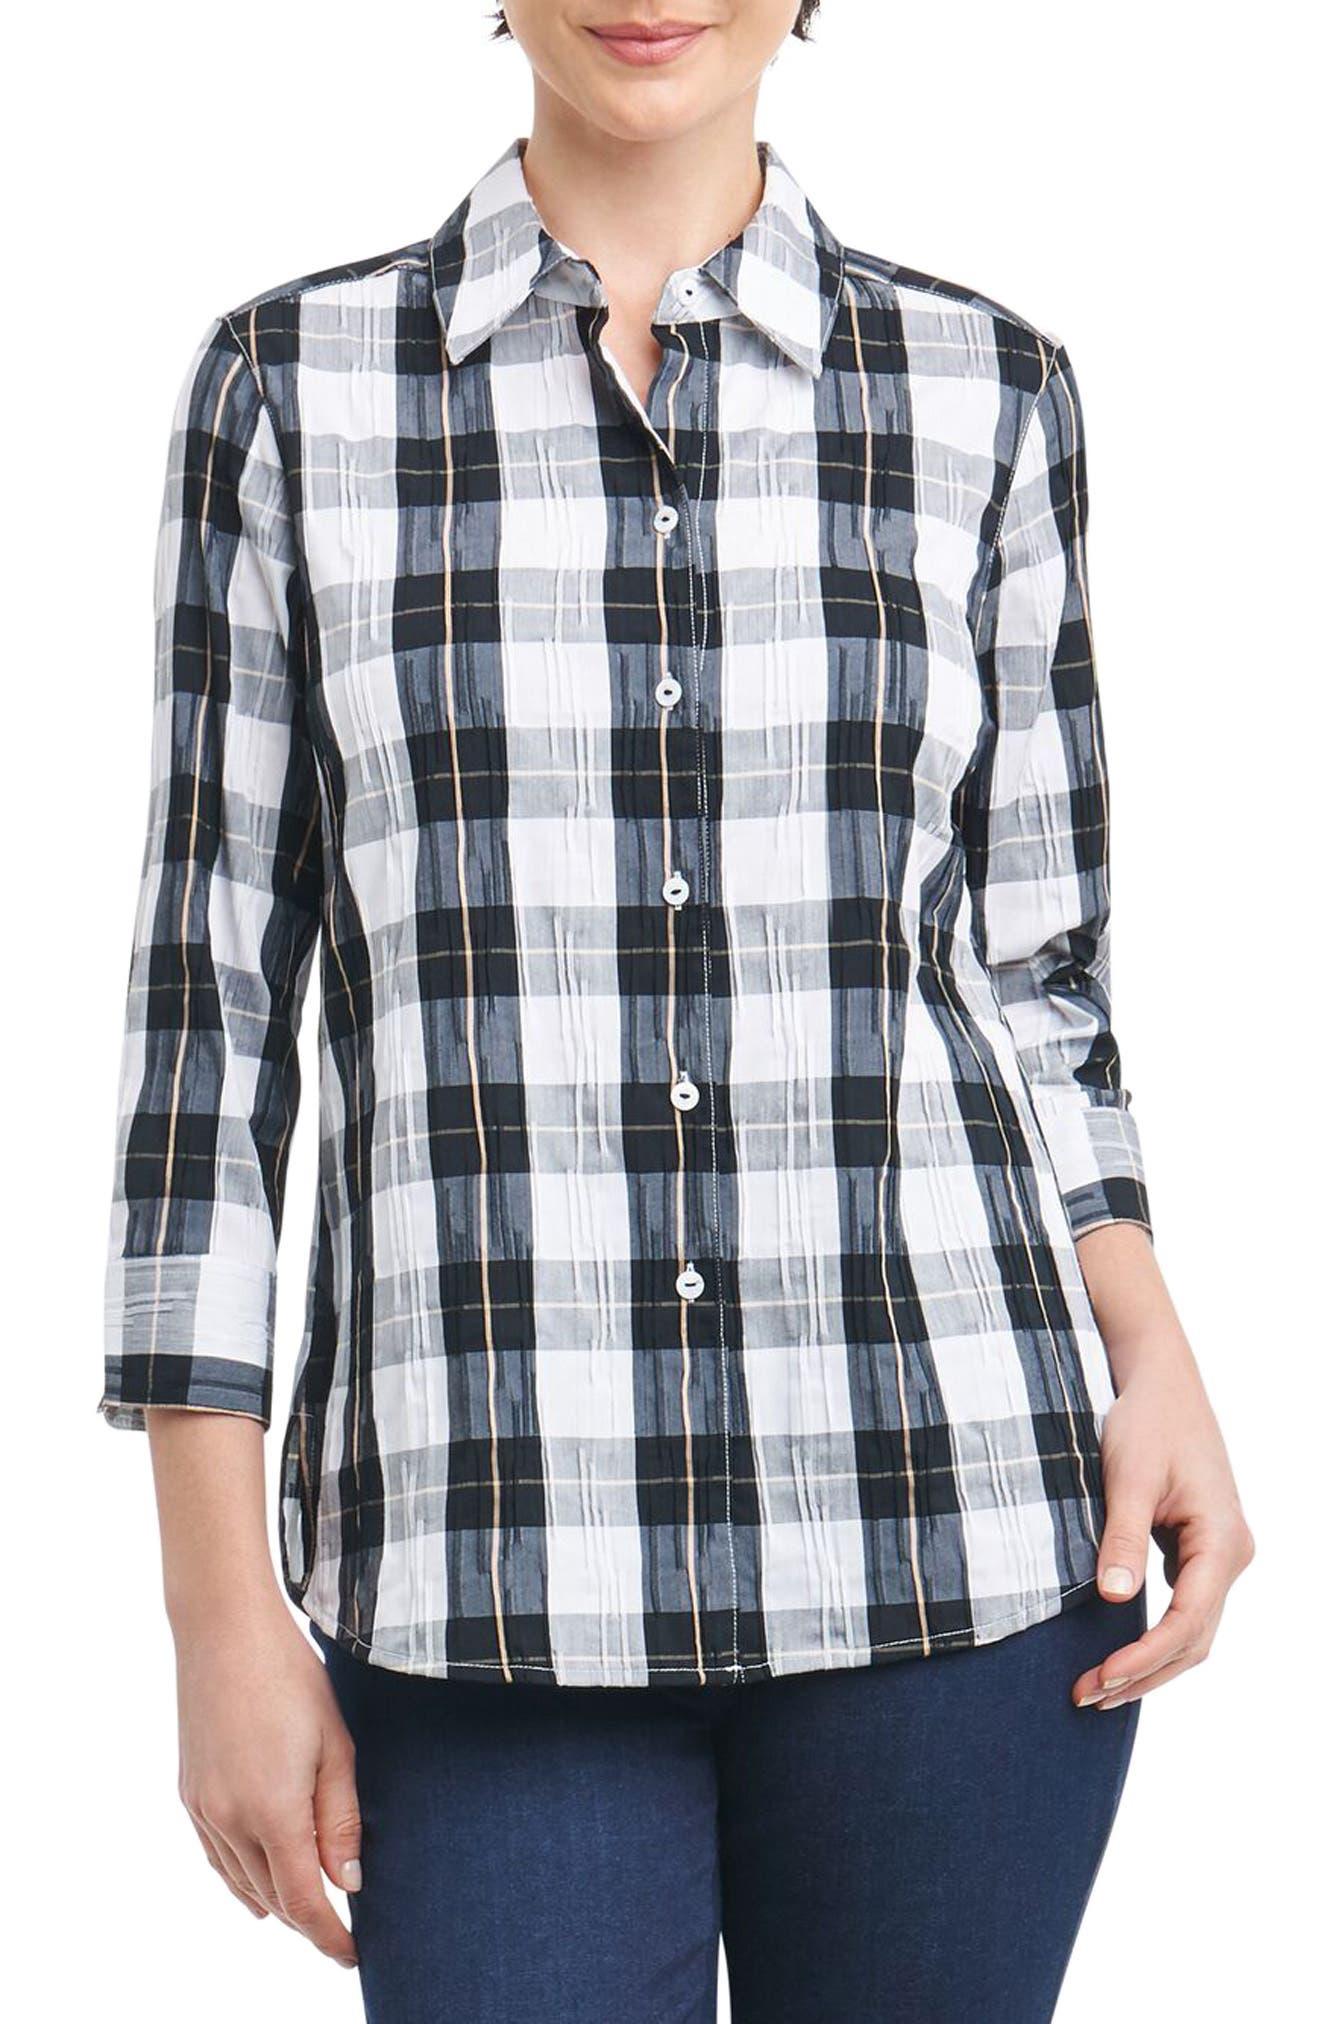 Sue Shaped Fit Crinkle Plaid Shirt,                         Main,                         color, 001